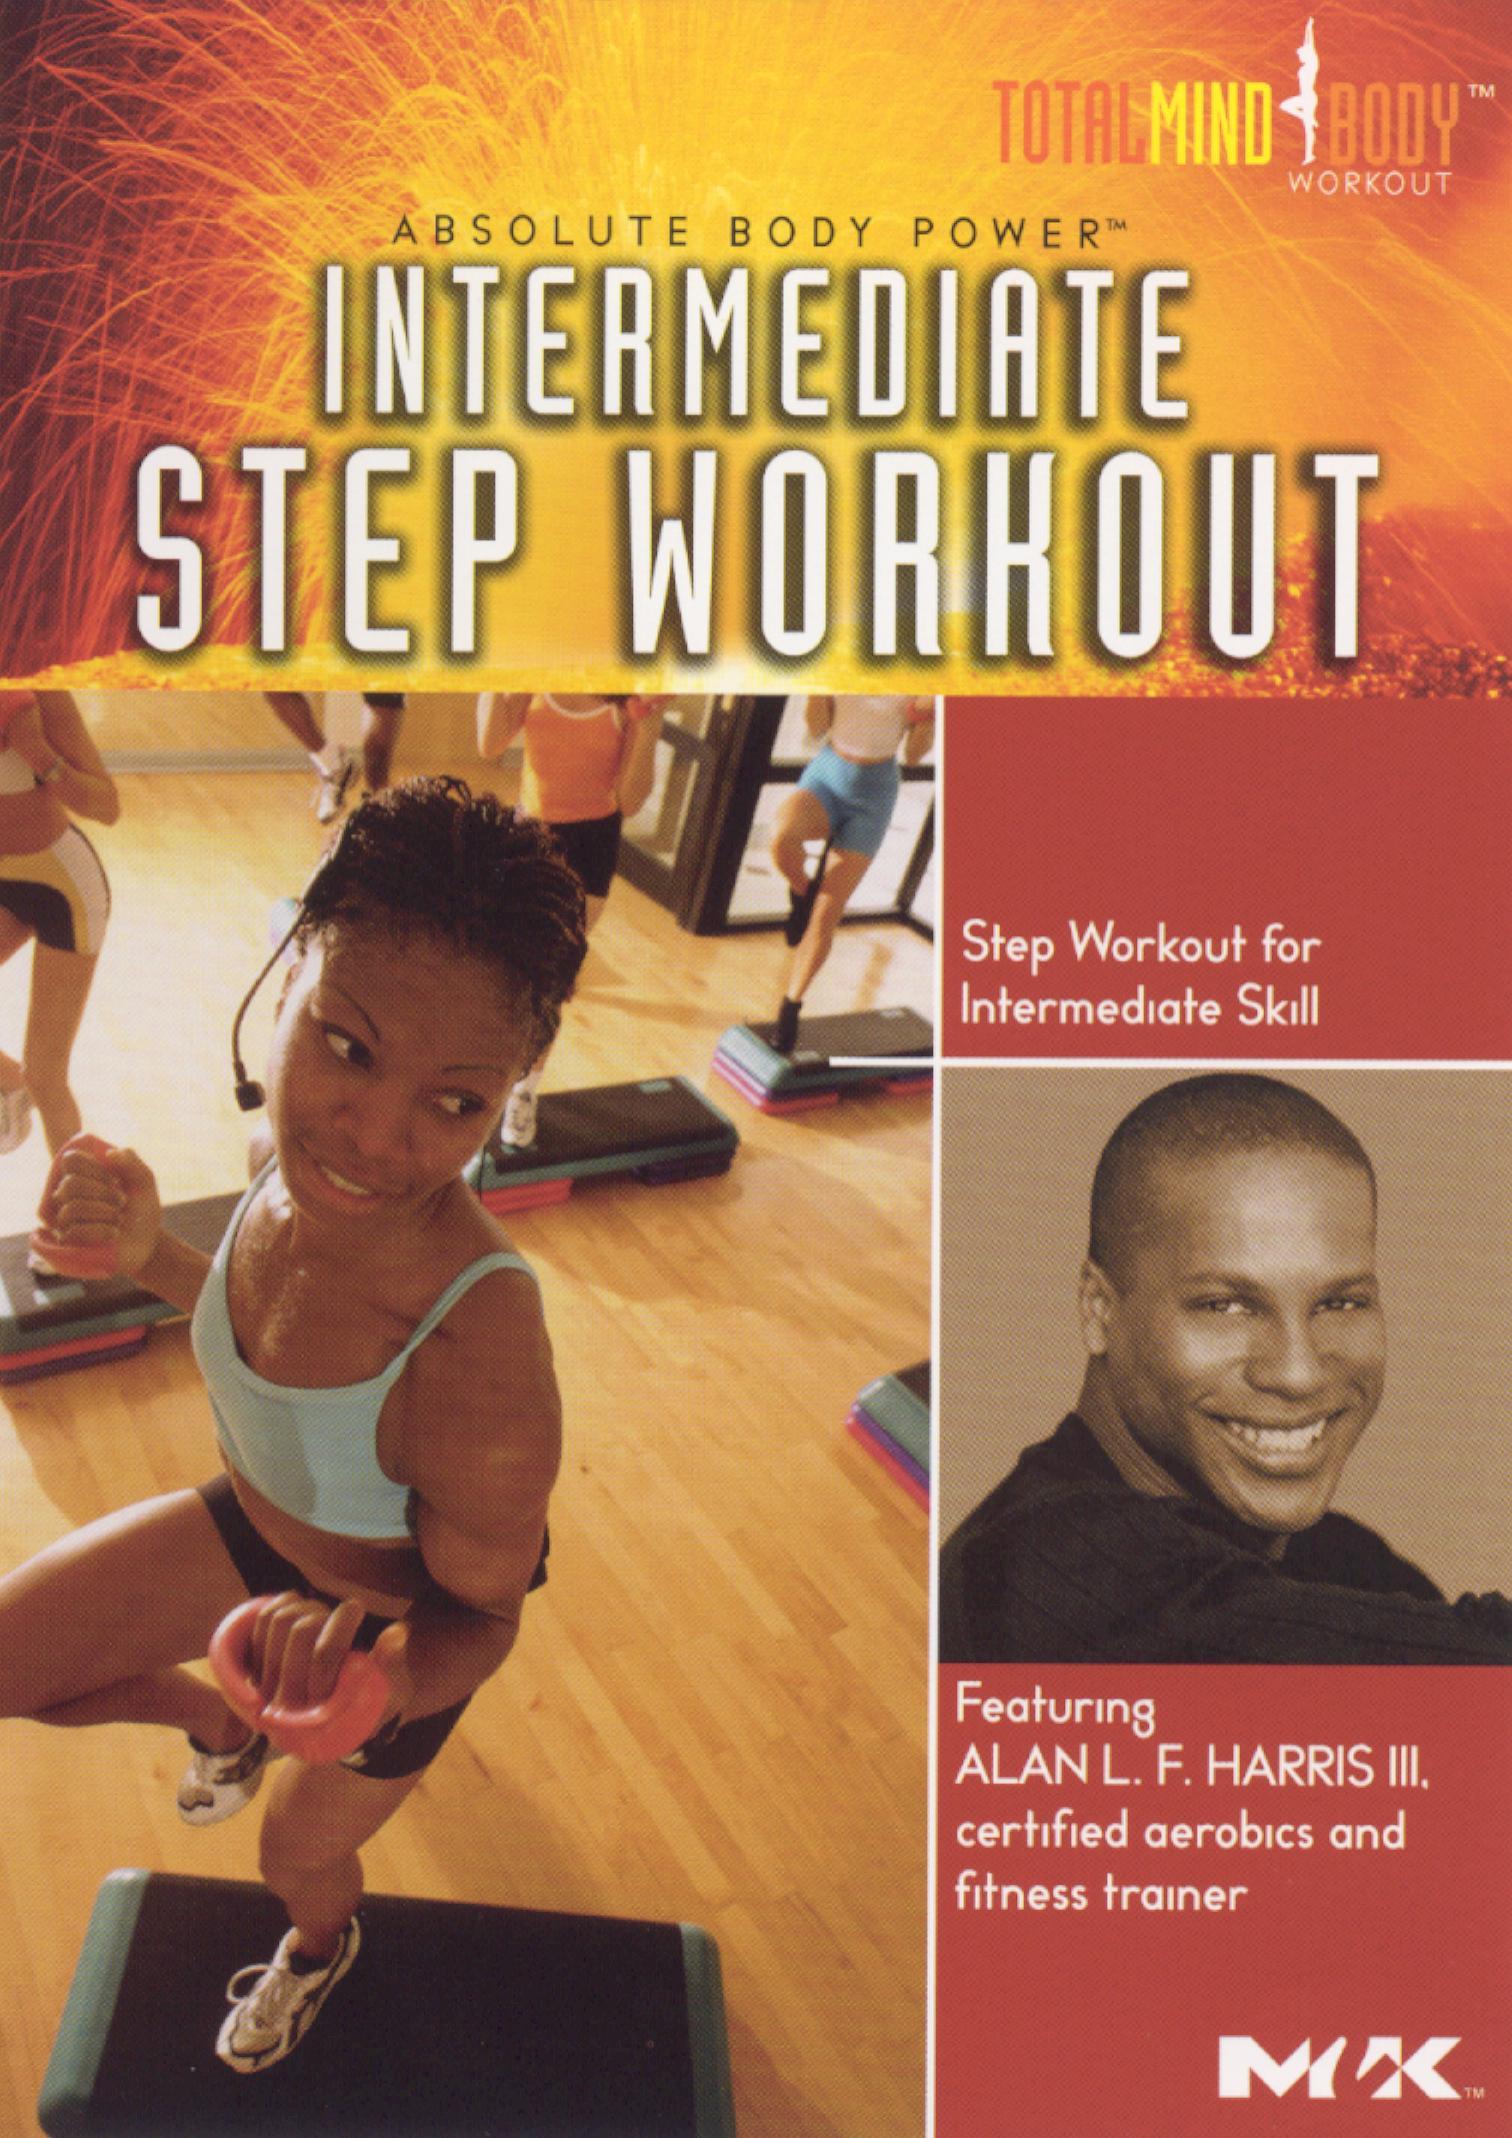 Absolute Body Power, Vol. 3: Intermediate Step Workout